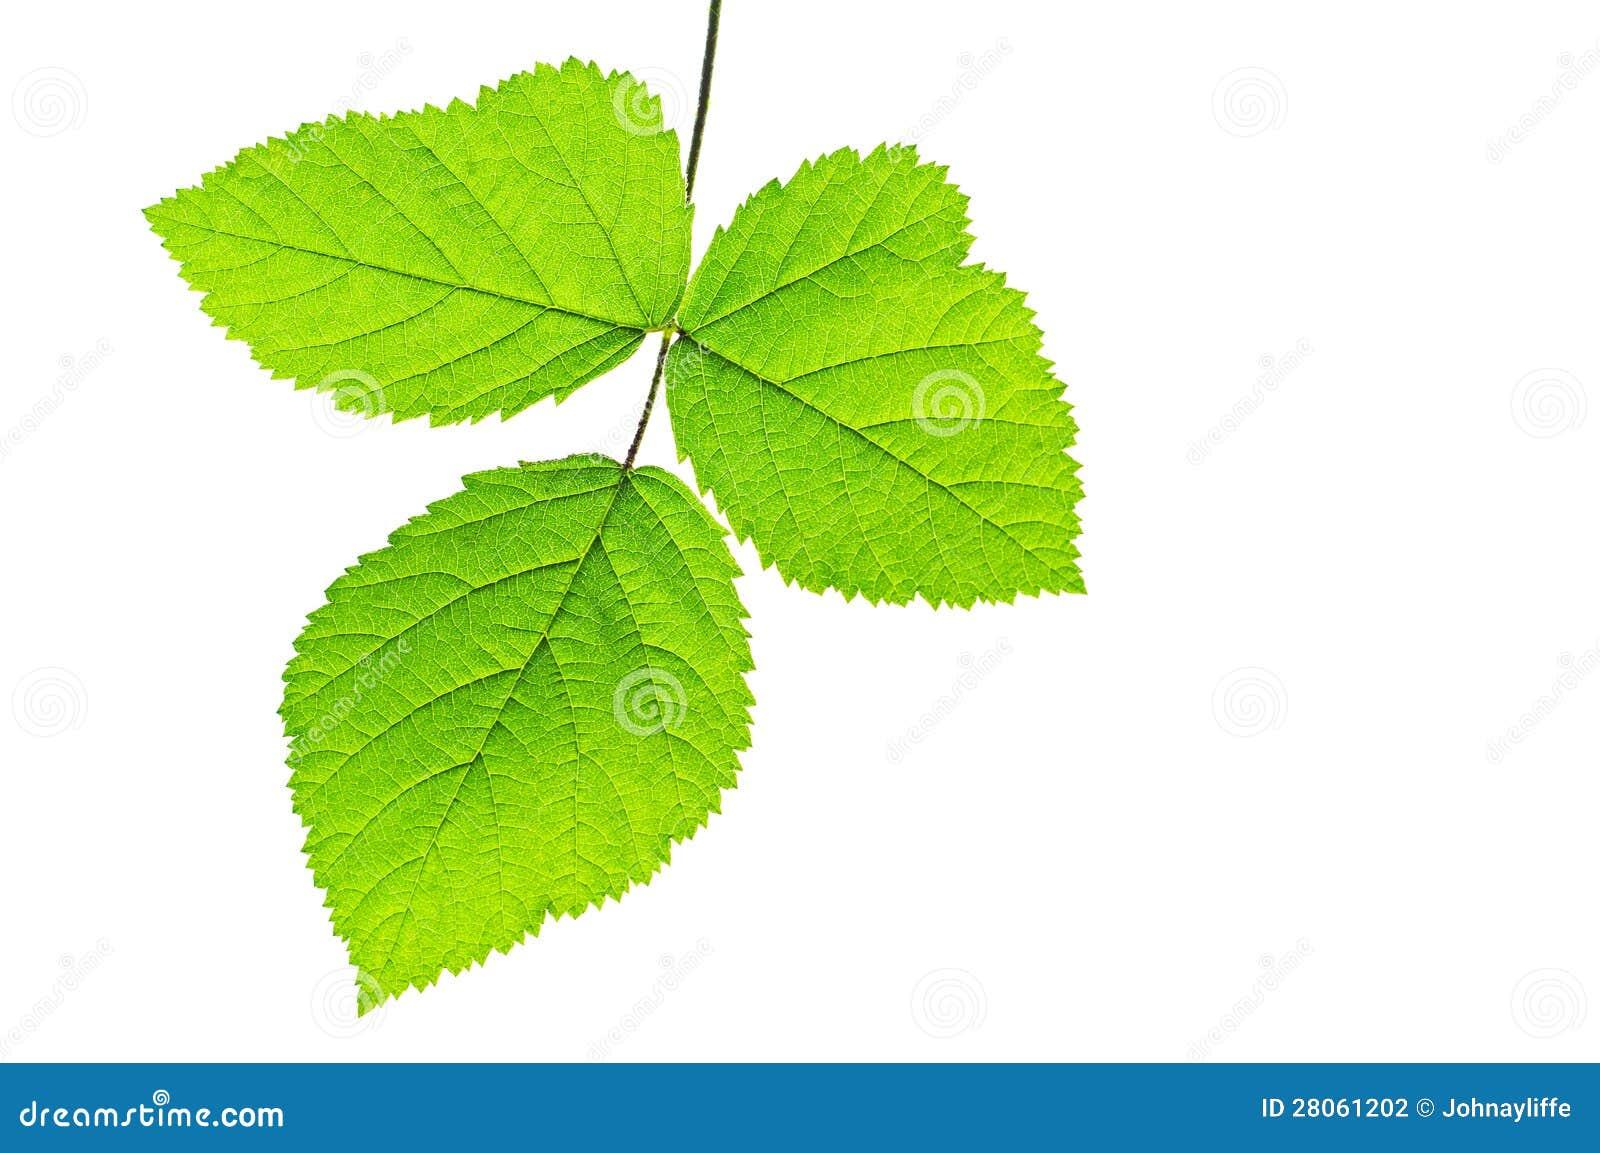 Three green leaves